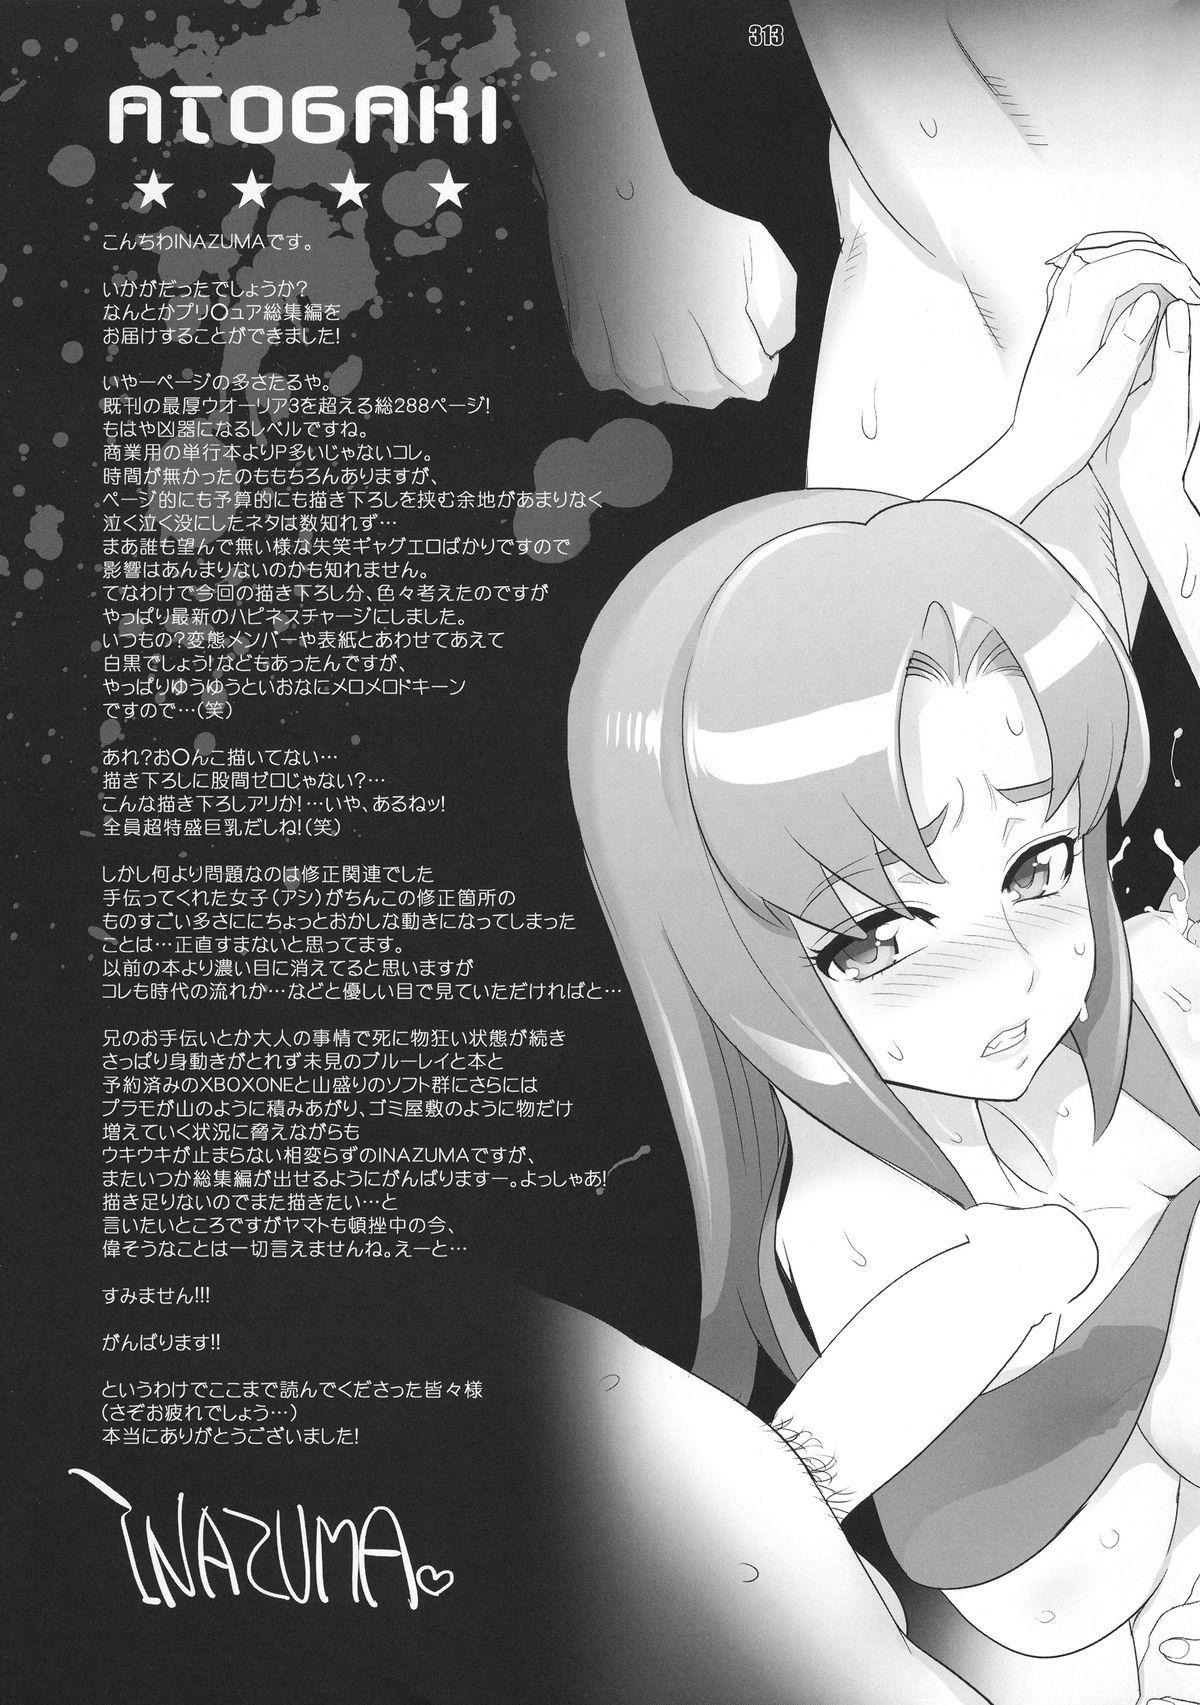 Inazuma Pretty Warrior 311